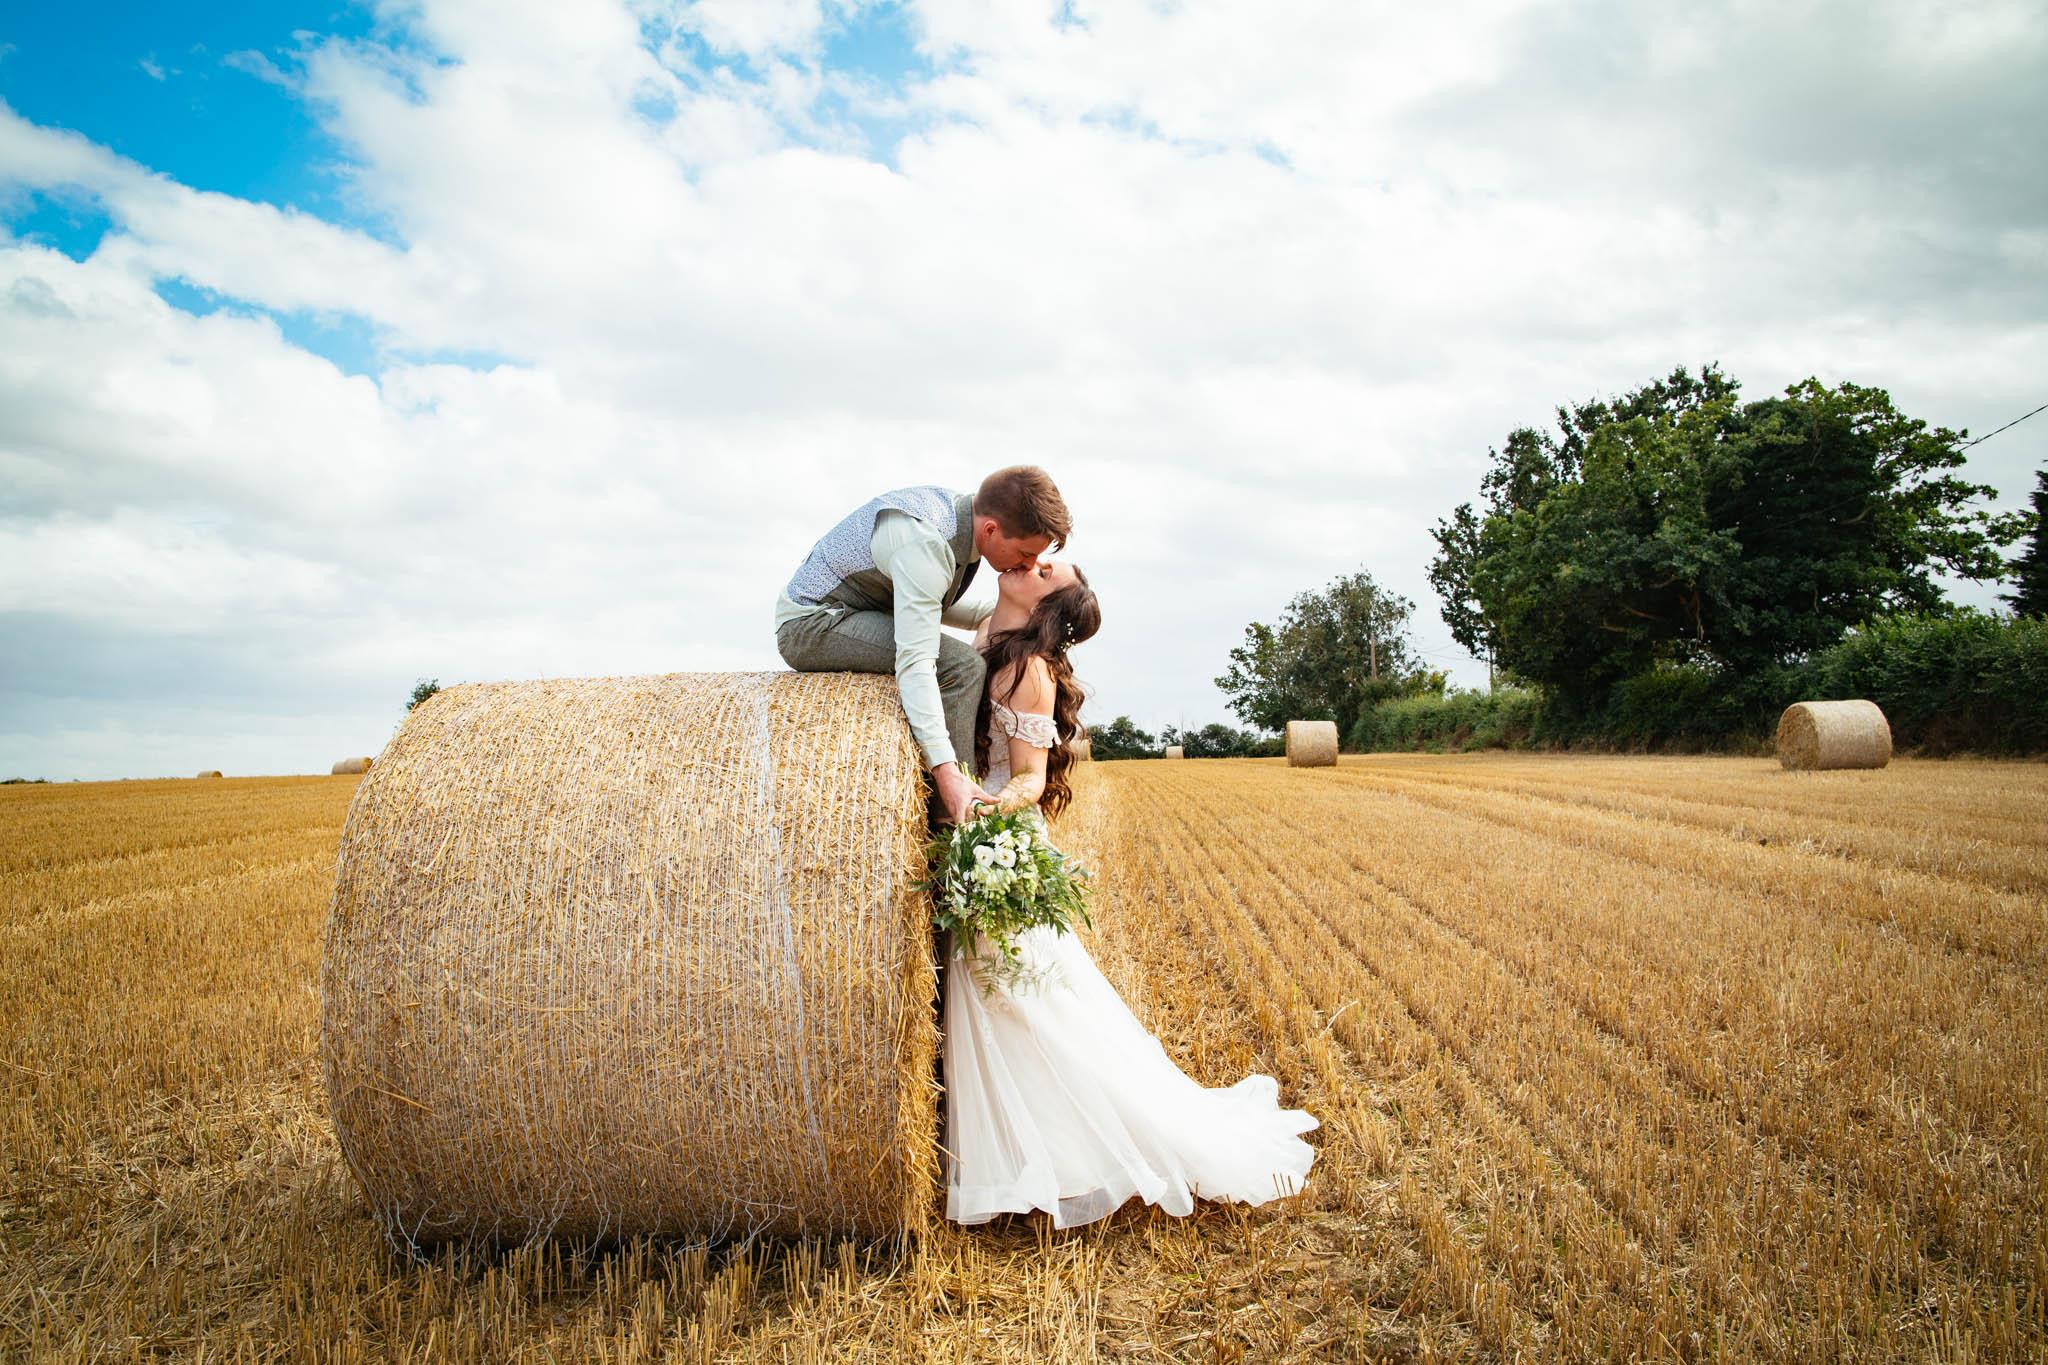 St Peter & St Paul church + Tipi Wedding: Rachel & Mike wedding photos